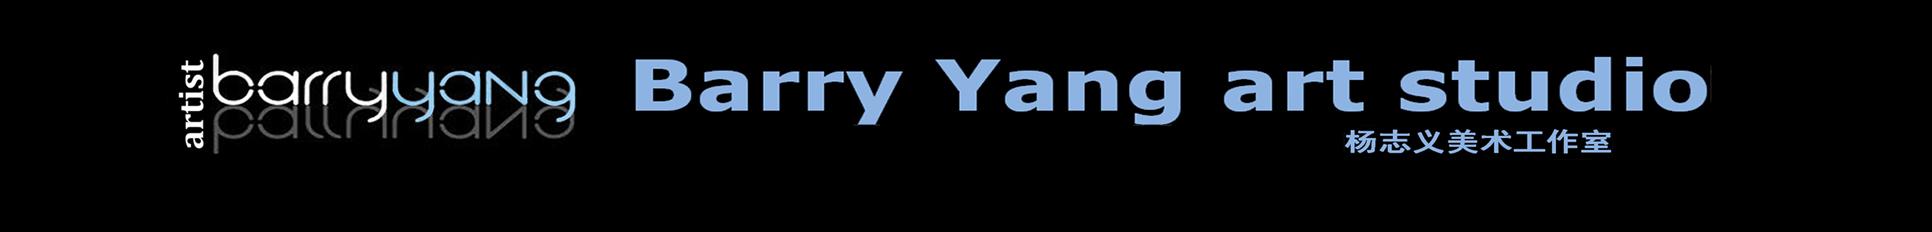 Barry Yang Art Studio - 杨志义油画工作室